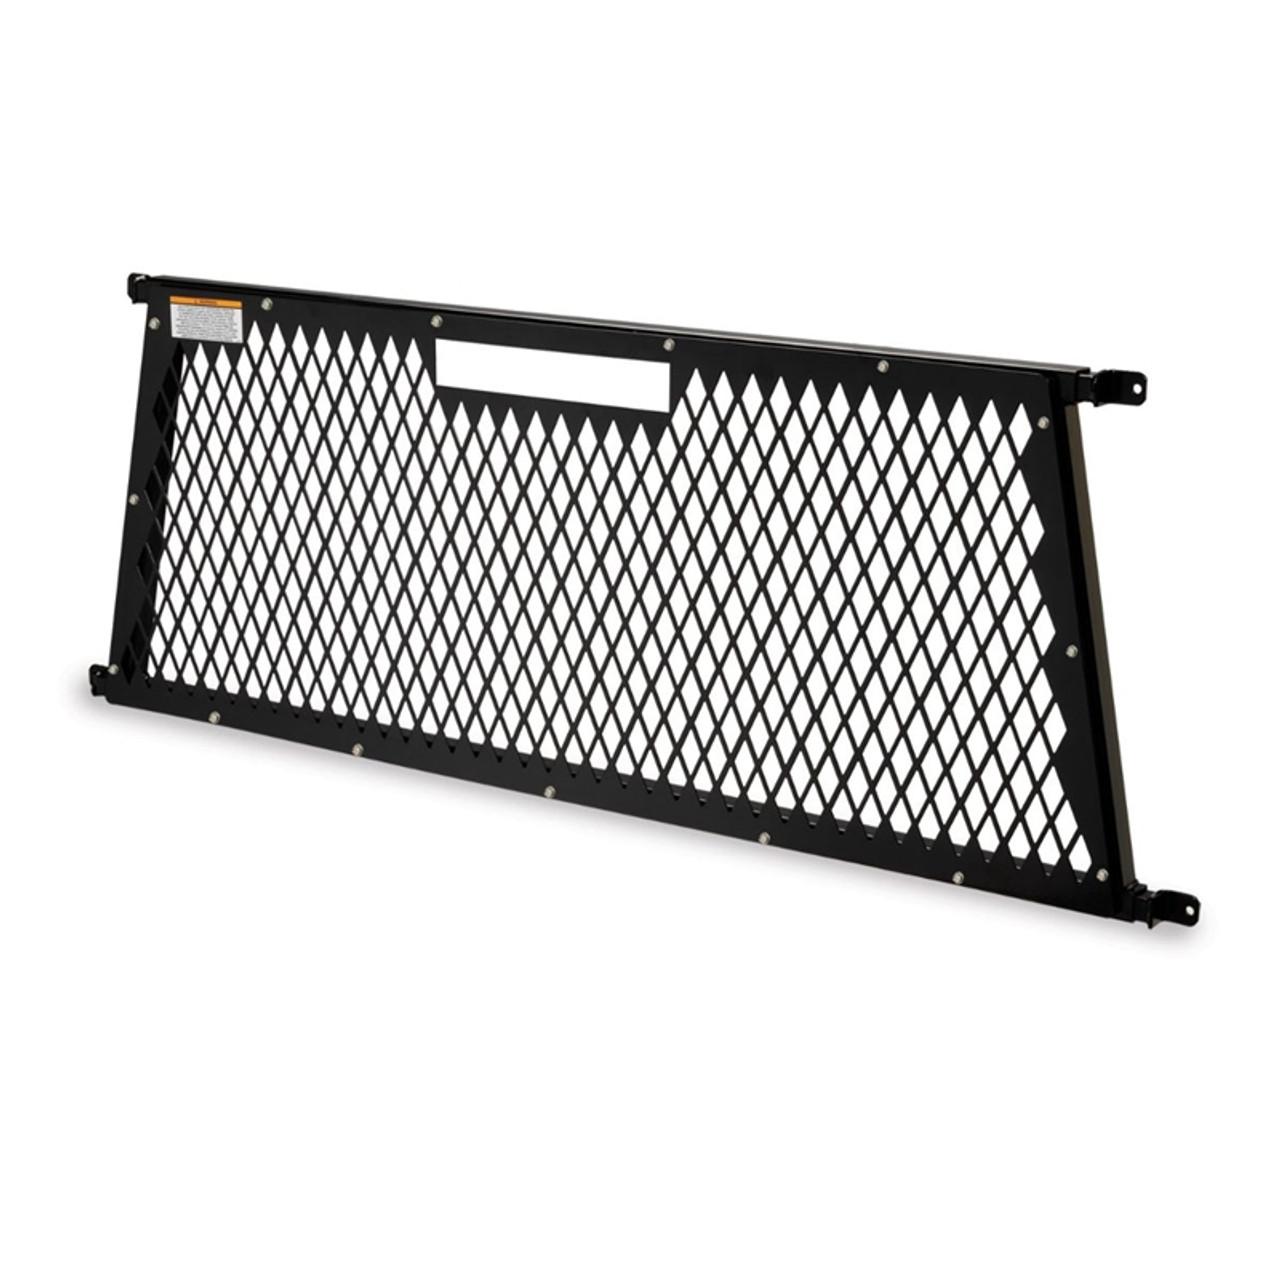 https leonardaccessories com product racks headache racks weatherguard truck rack screen